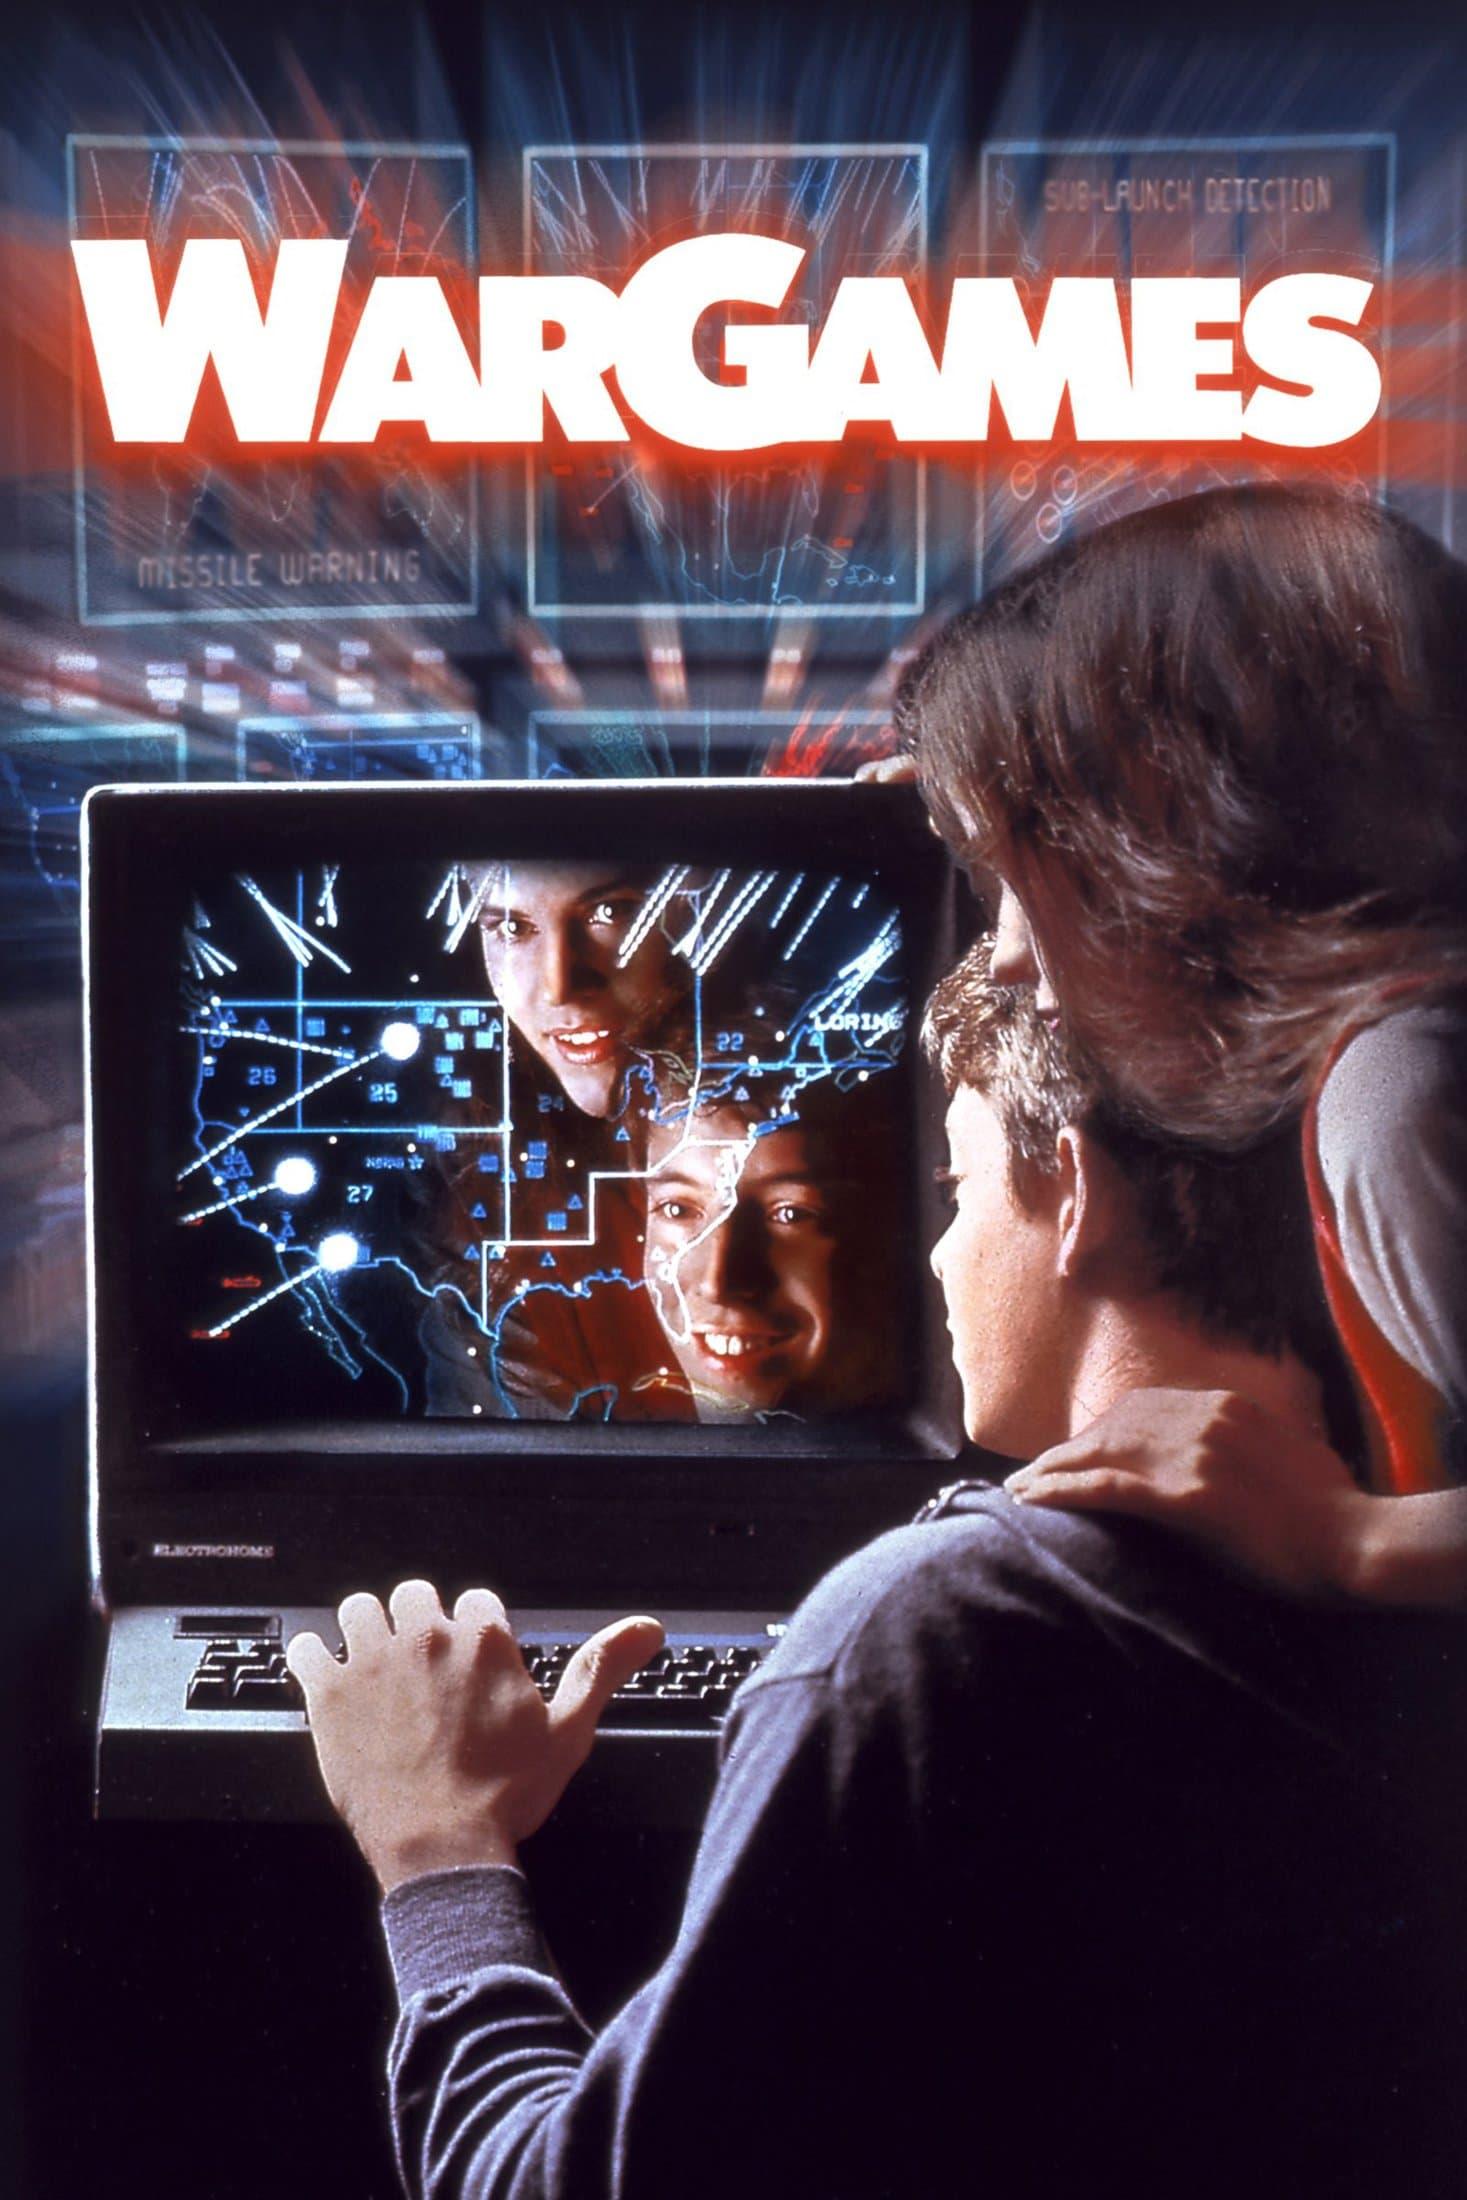 Retro 1980s War Games movie poster